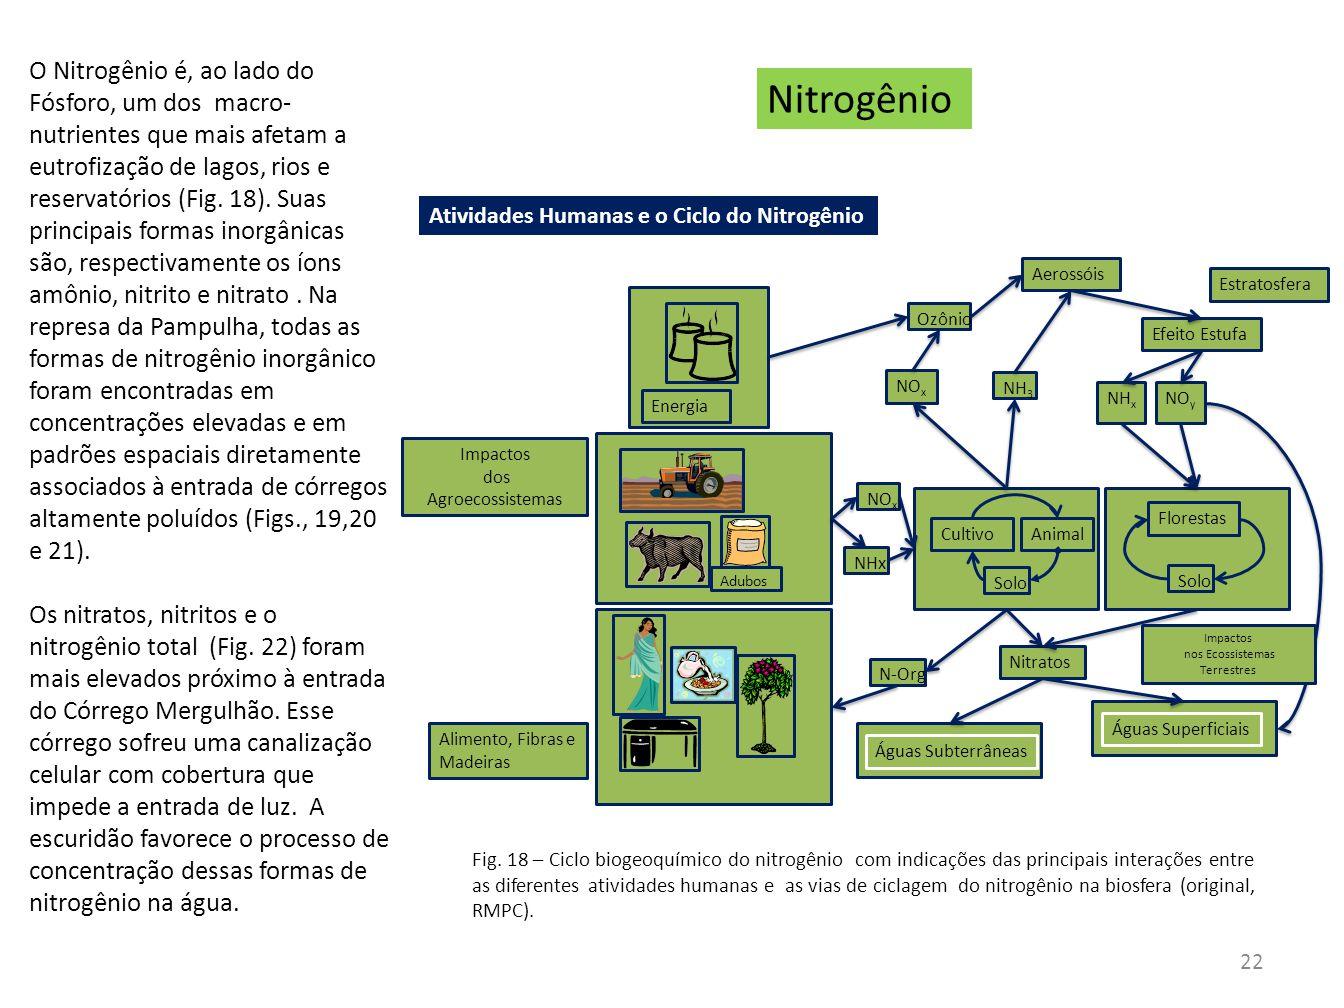 Nitrogênio CultivoAnimal Solo Florestas Solo Nitratos Adubos Alimento, Fibras e Madeiras Energia NO x Ozônio Efeito Estufa Estratosfera Águas Subterrâ